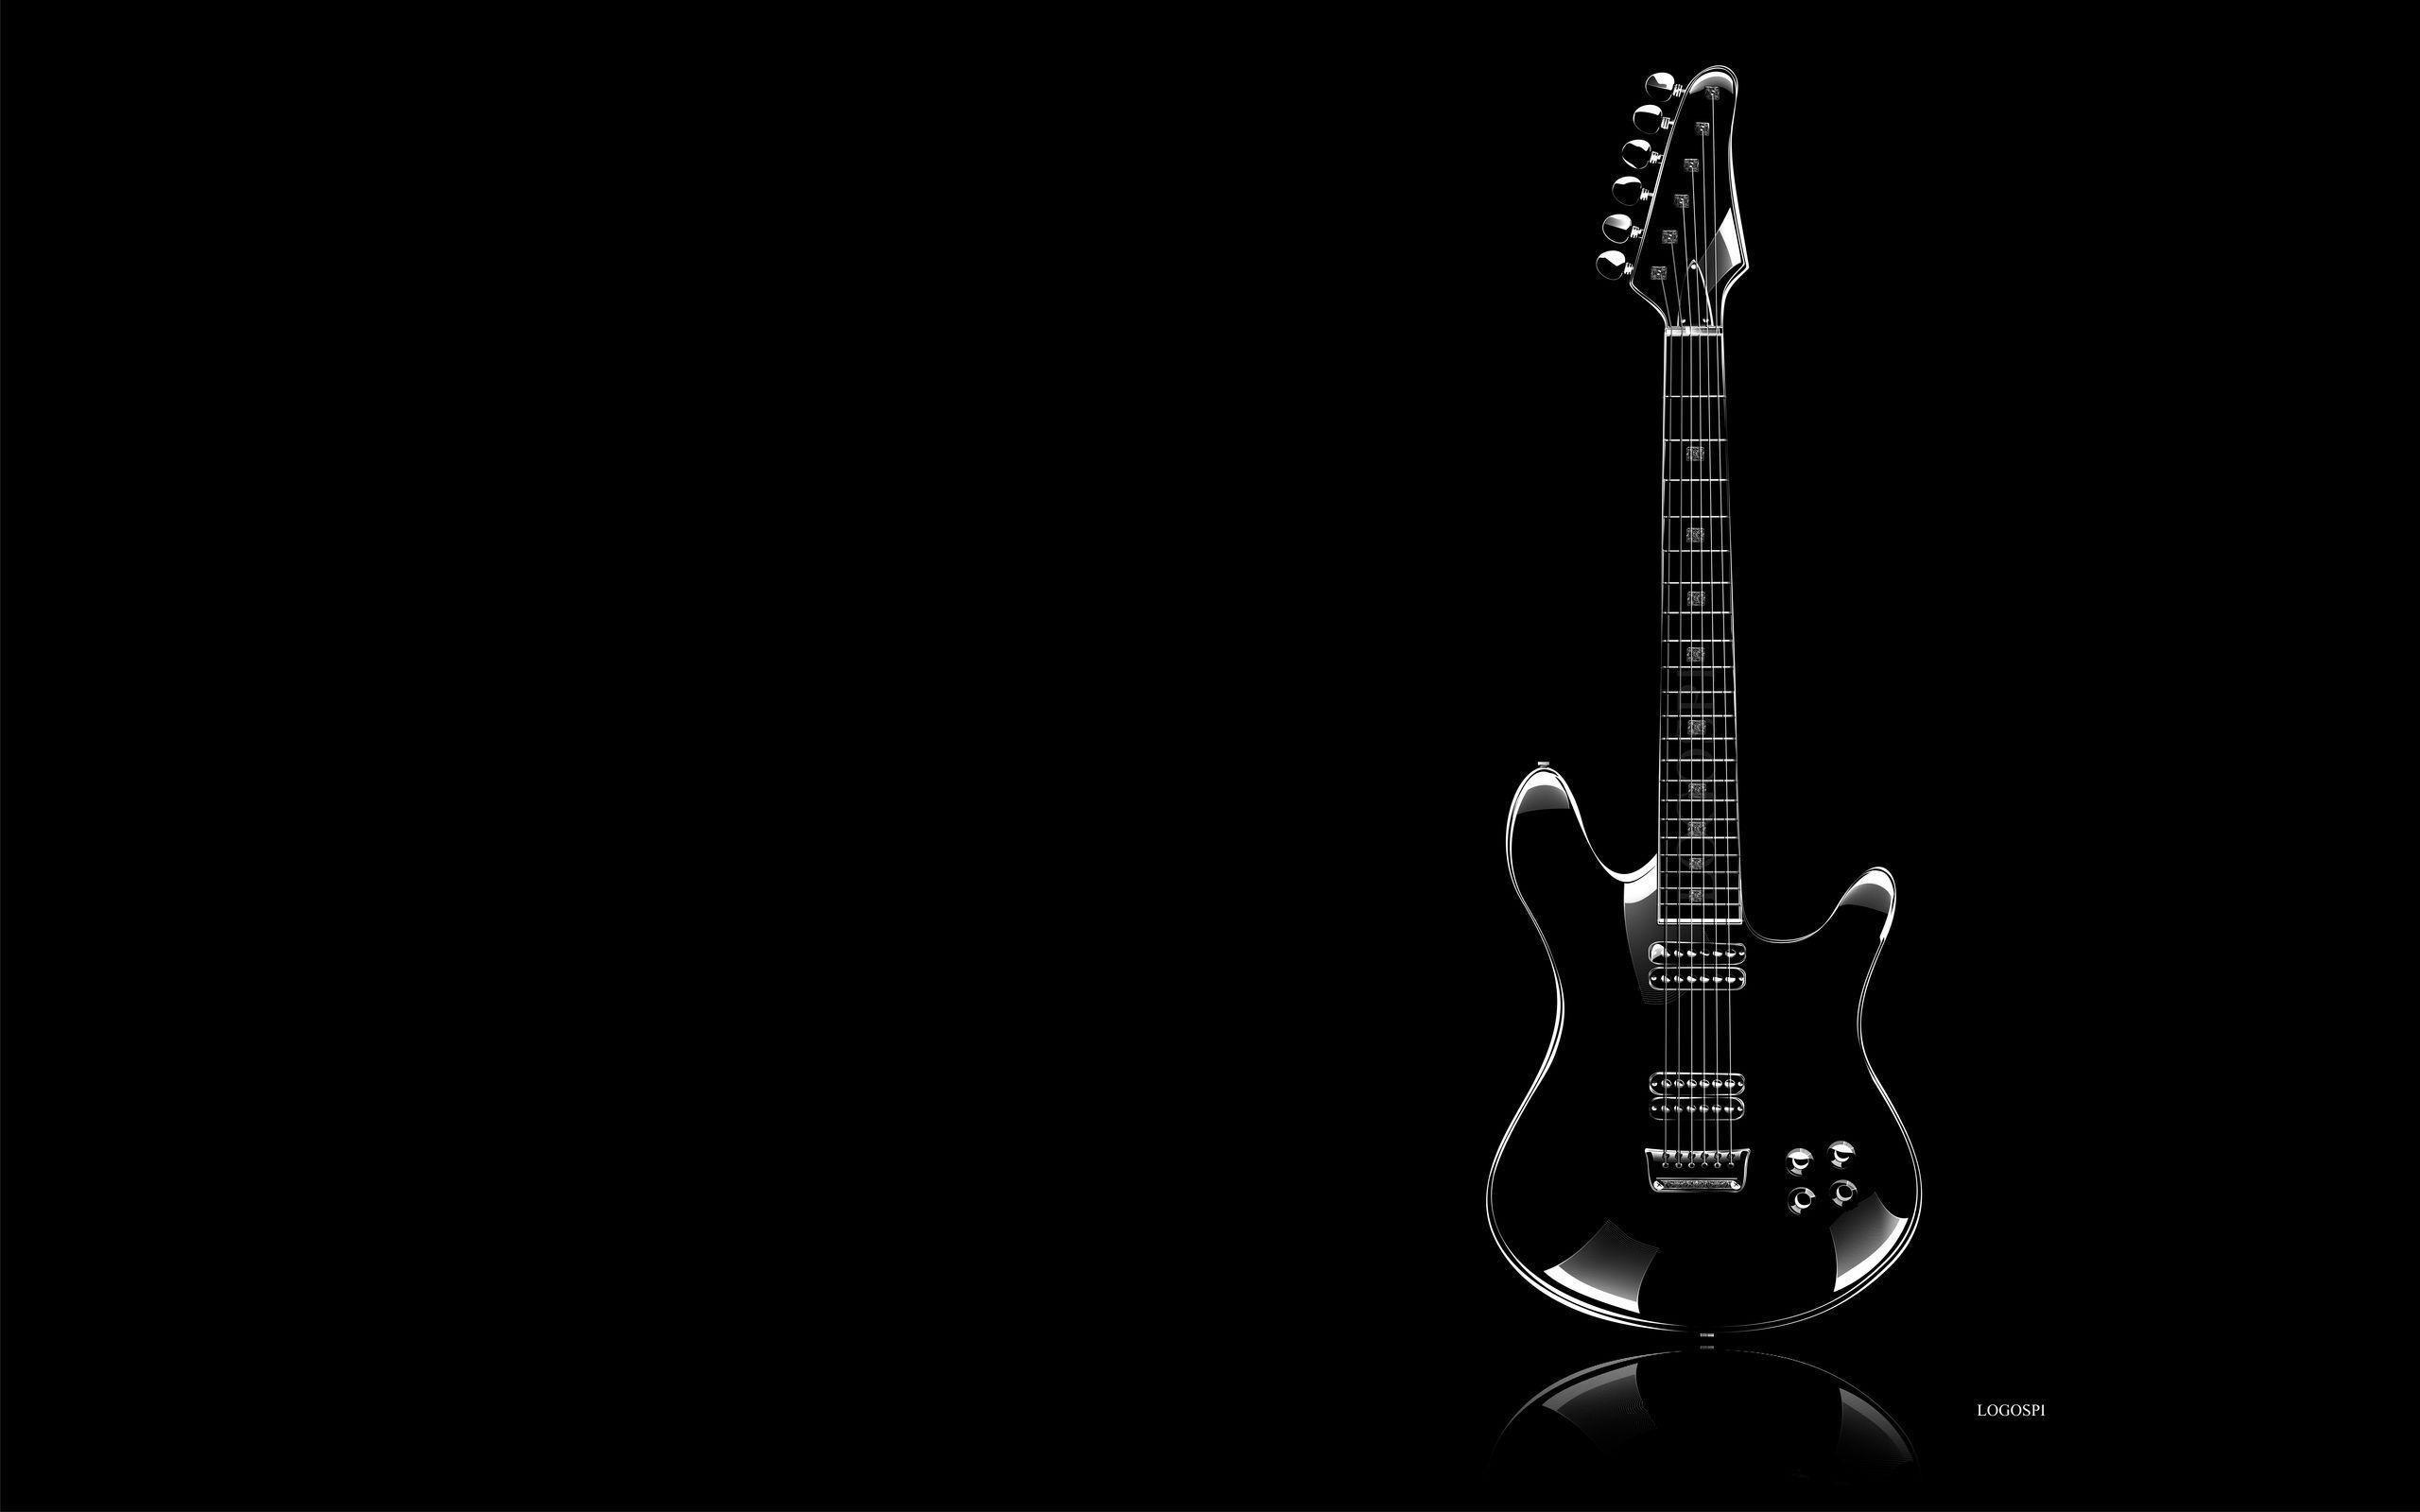 Guitar P O White Background Wallpaper